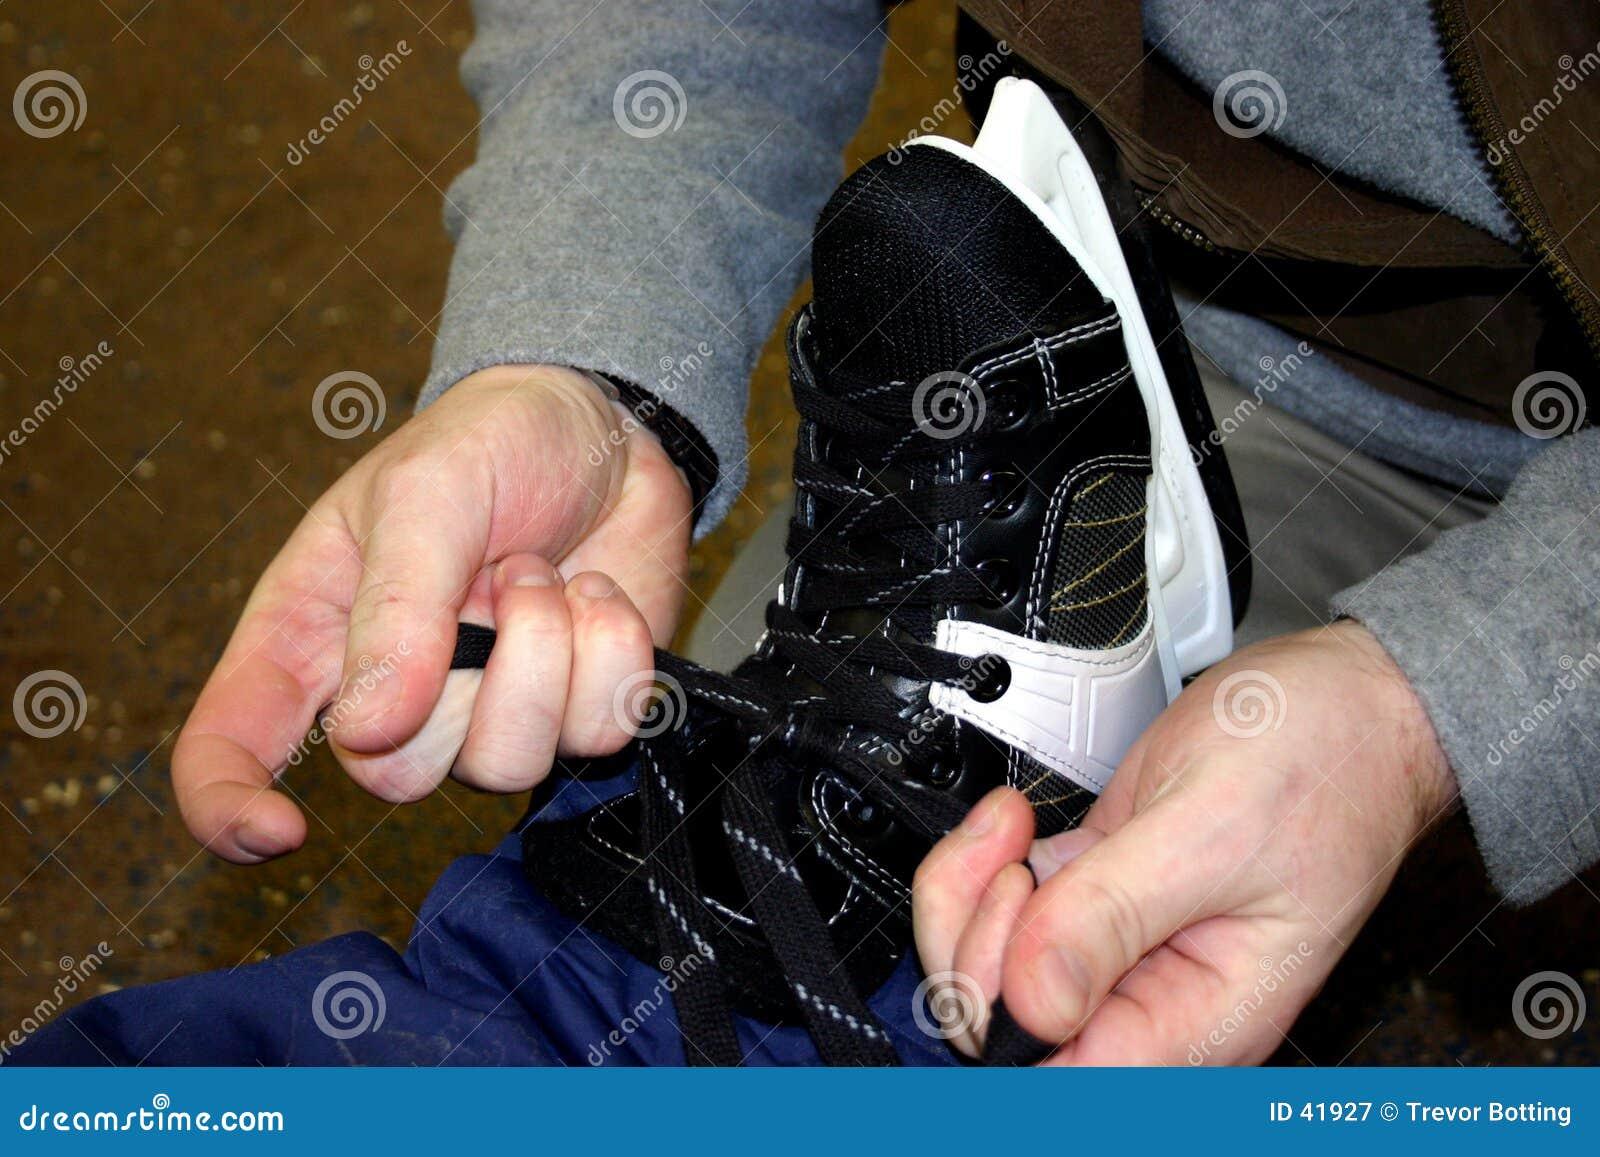 Tieing the skates